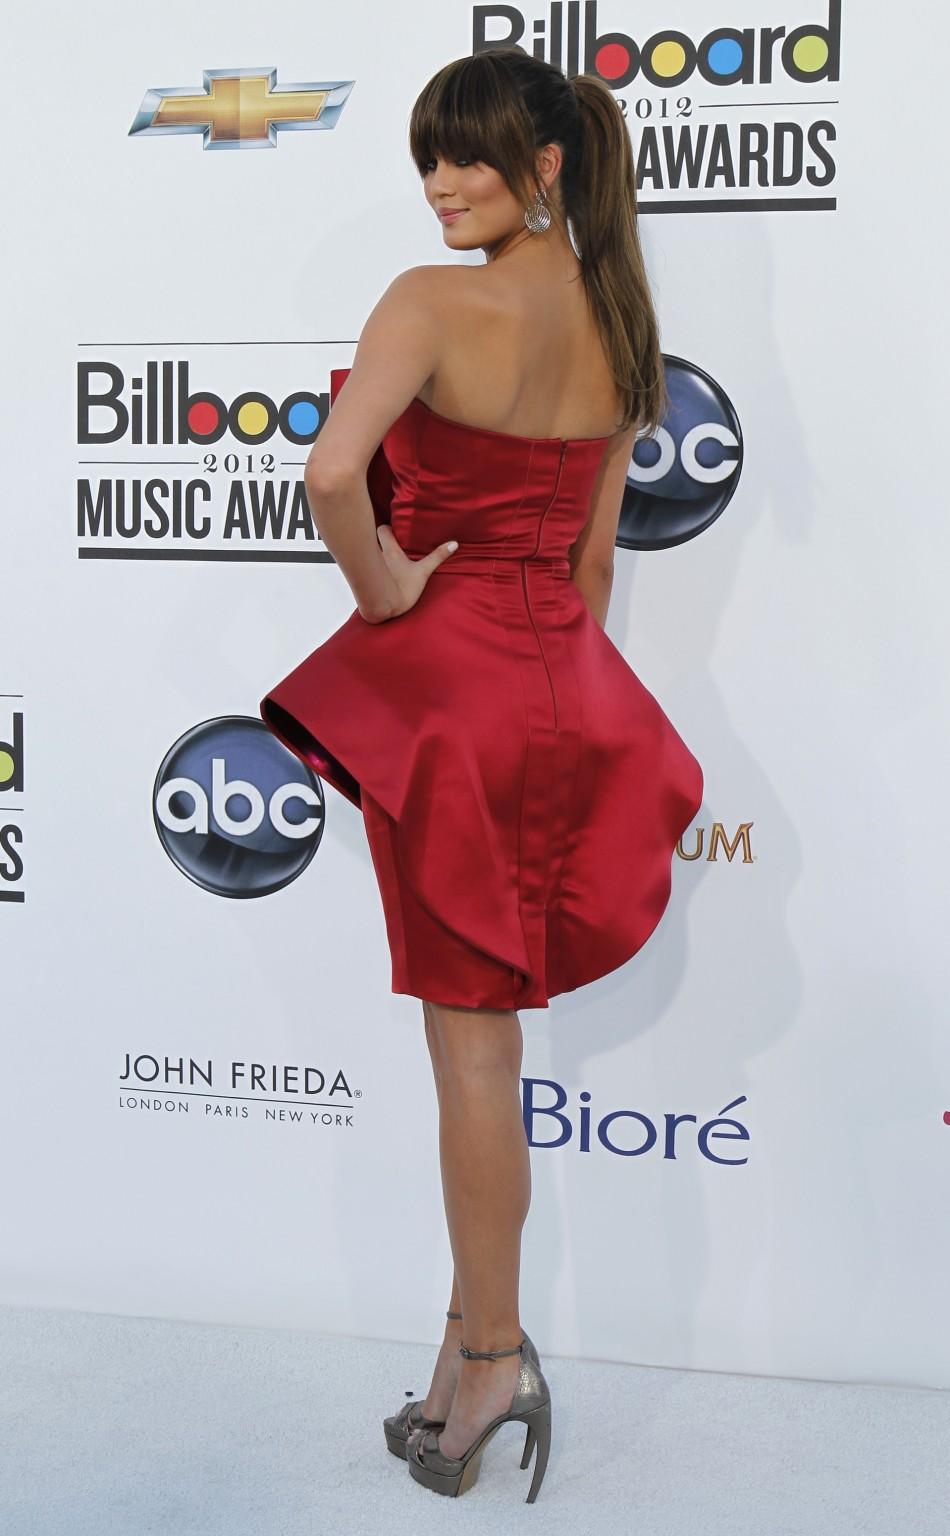 Model Chrissy Teigen arrives at the 2012 Billboard Music Awards in Las Vegas